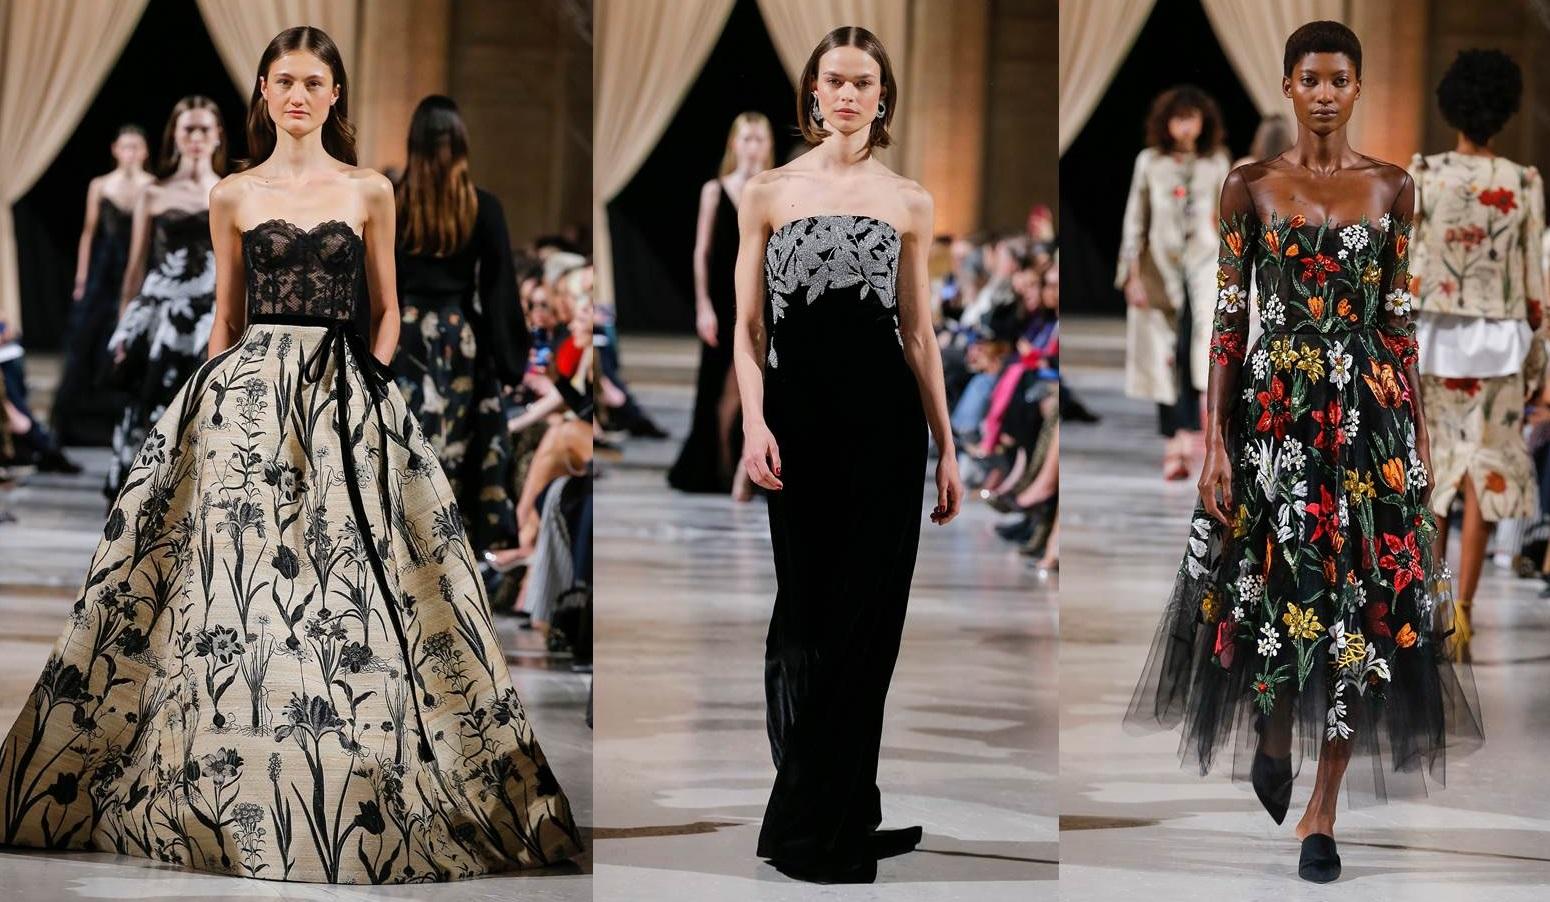 Vestiti Cerimonia Haute Couture.Abiti Da Cerimonia Oscar De La Renta 2018 2019 La Nuova